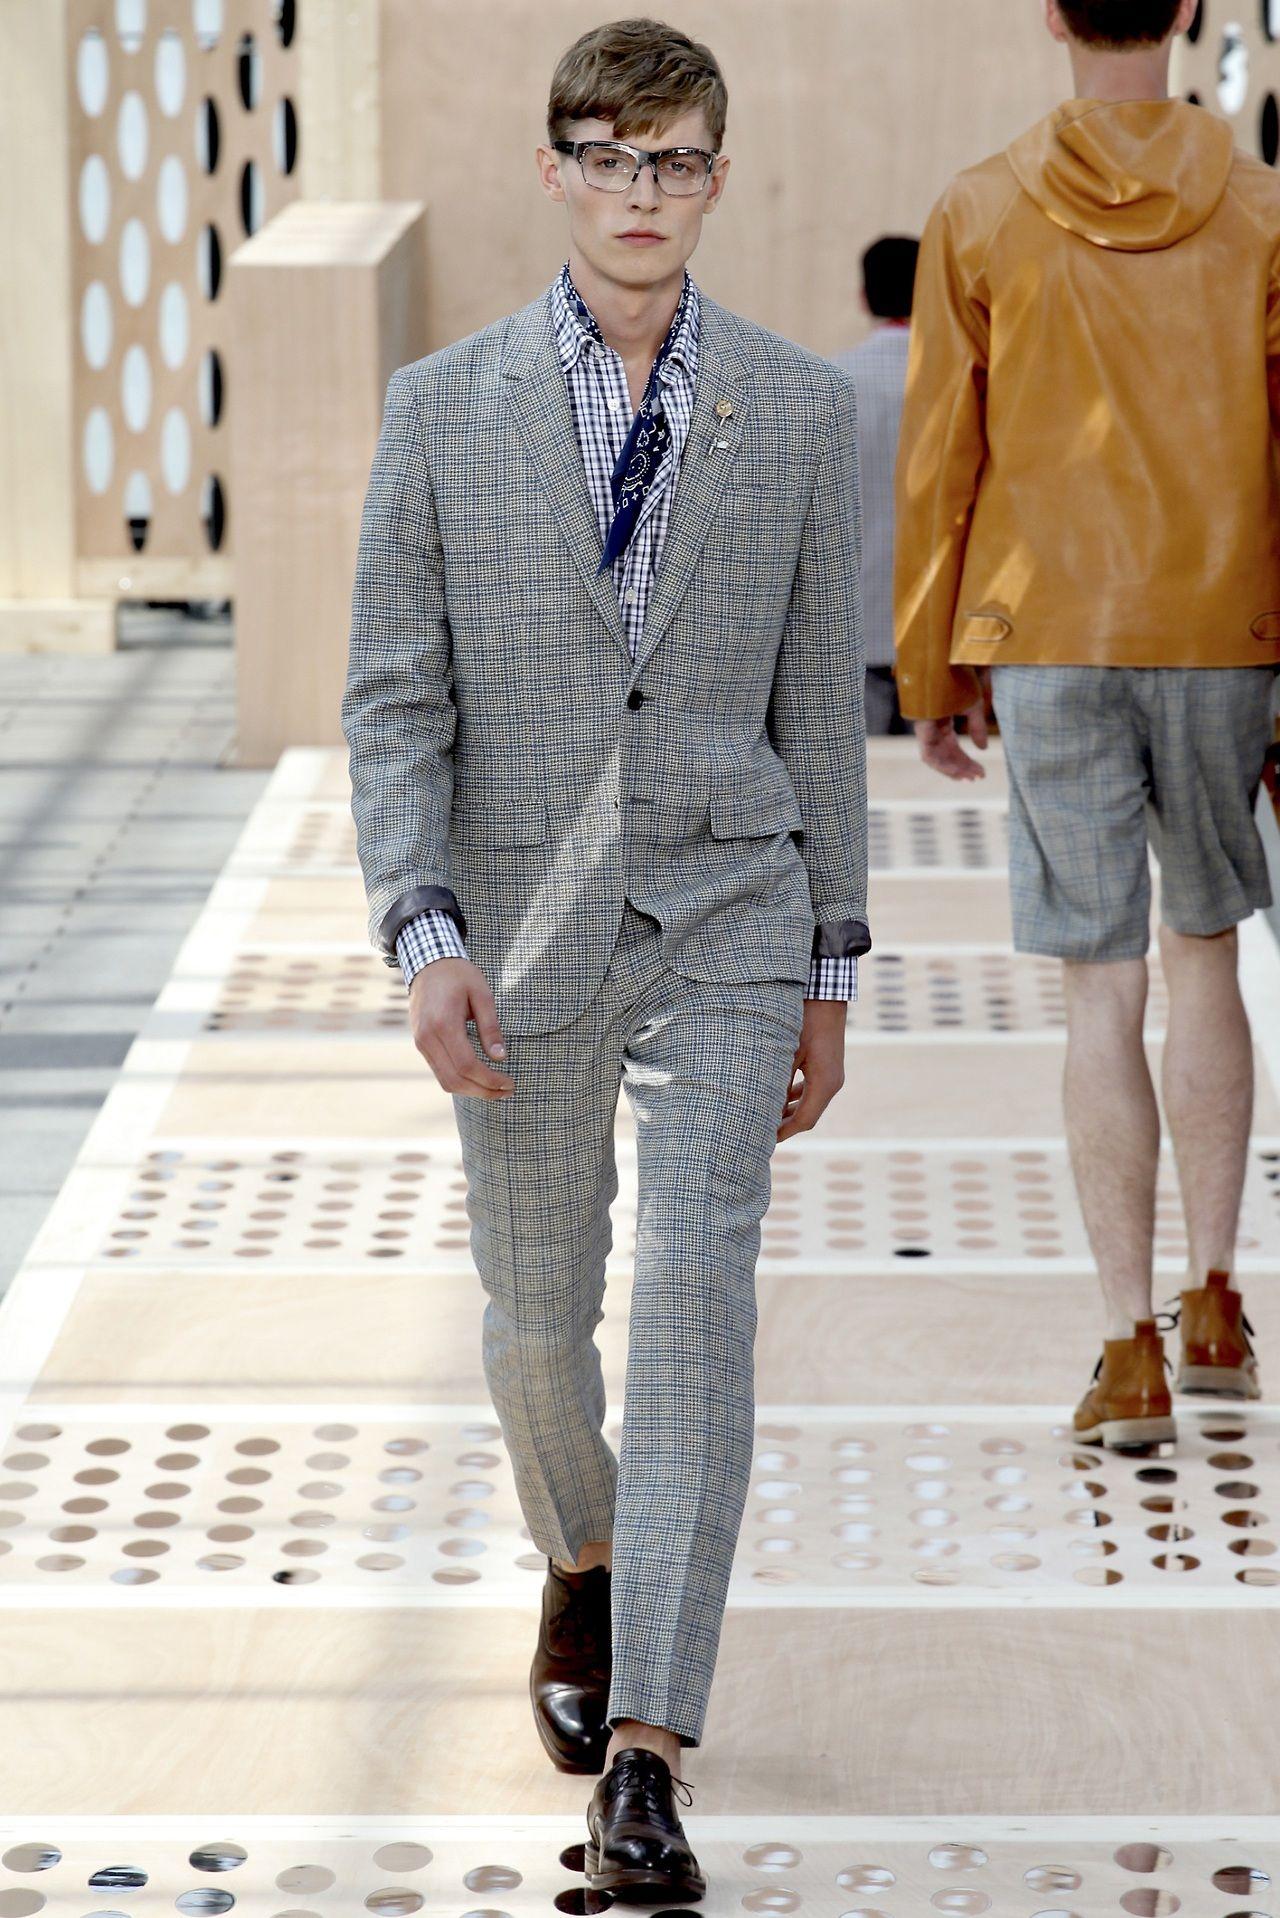 #youcancallmehitch #barneybarrett #minimalism #fashion #style #bandana #malemodel #greysuit #LV #louis_vuitton #barney_barrett